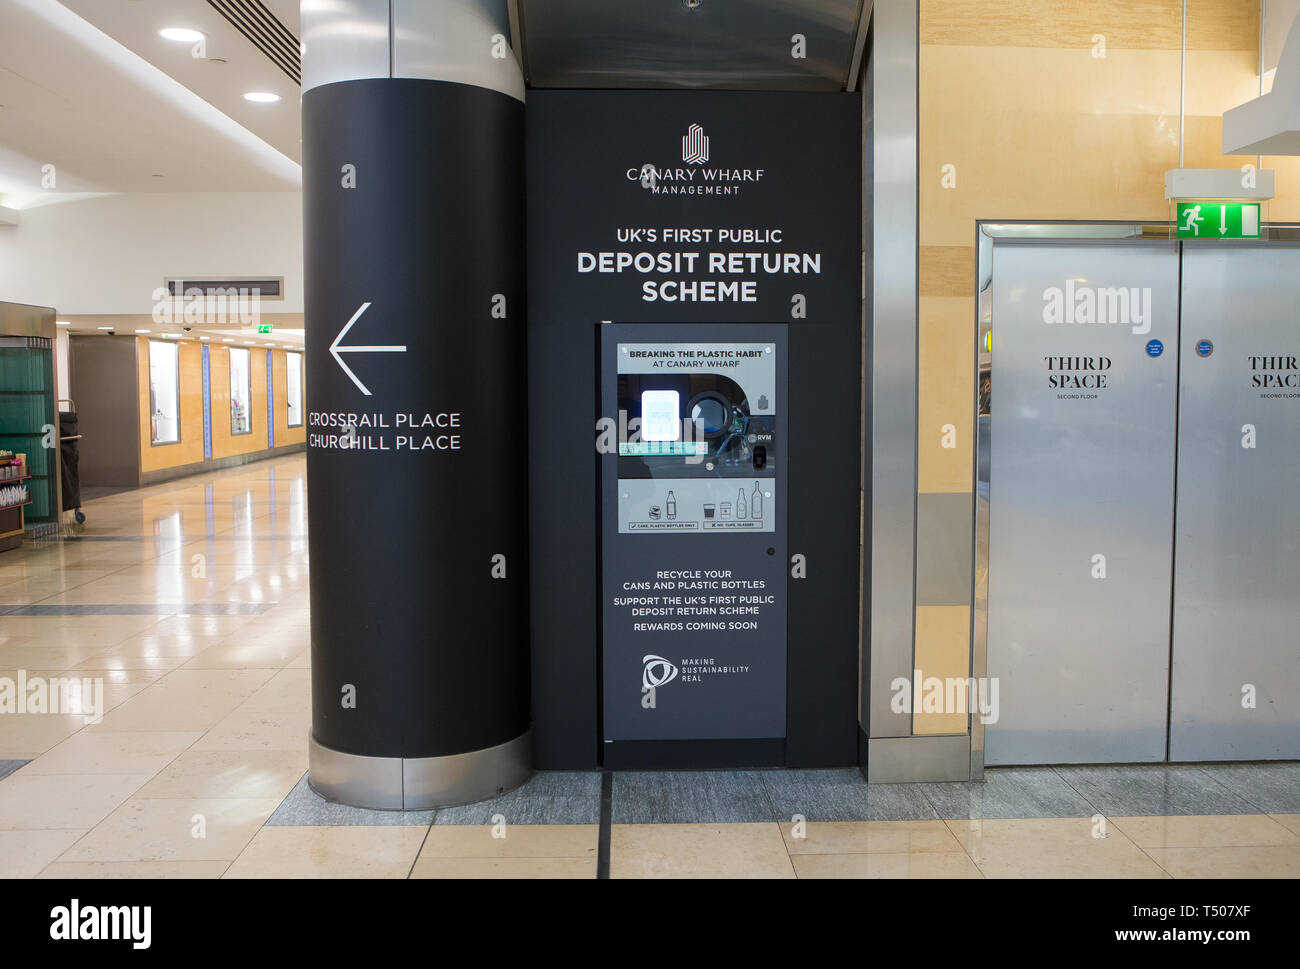 UK's first public Deposit Return Scheme machine, Canary Wharf, London England UK - Stock Image